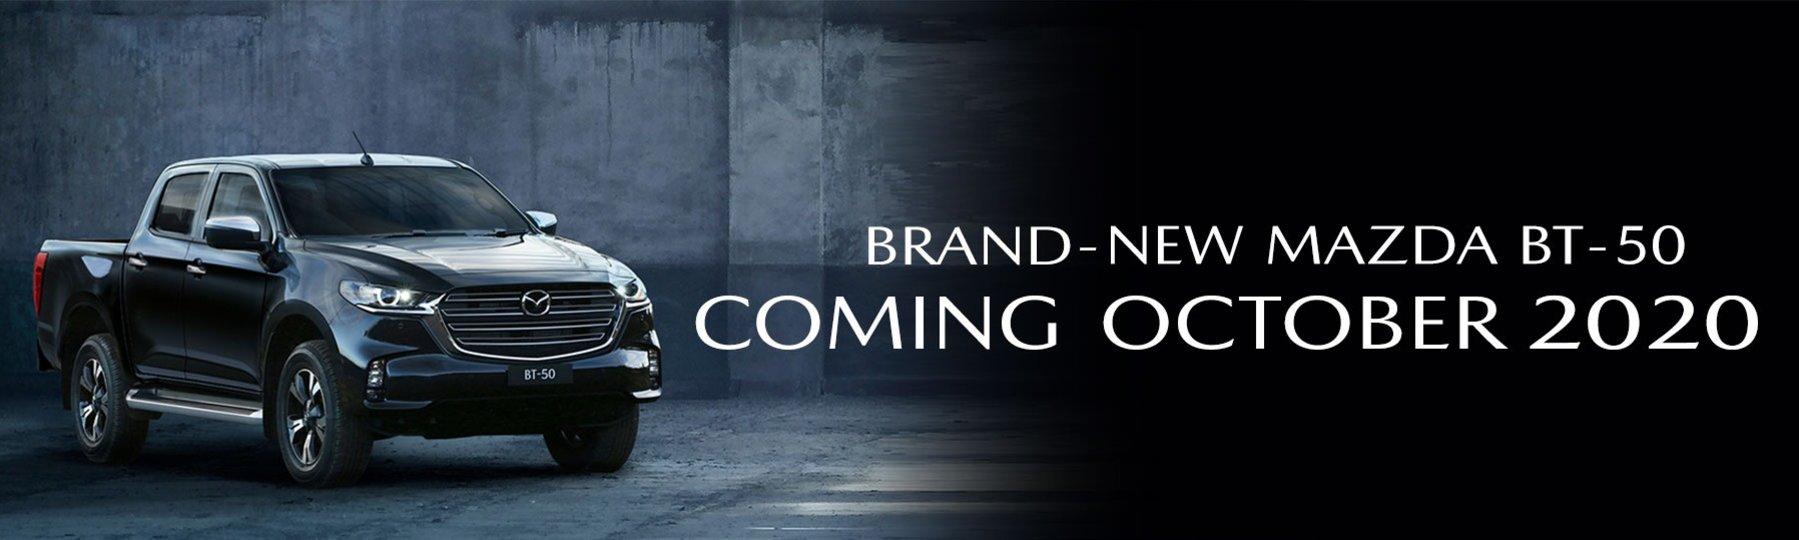 Werribee Mazda Brand New BT-50 Coming Soon